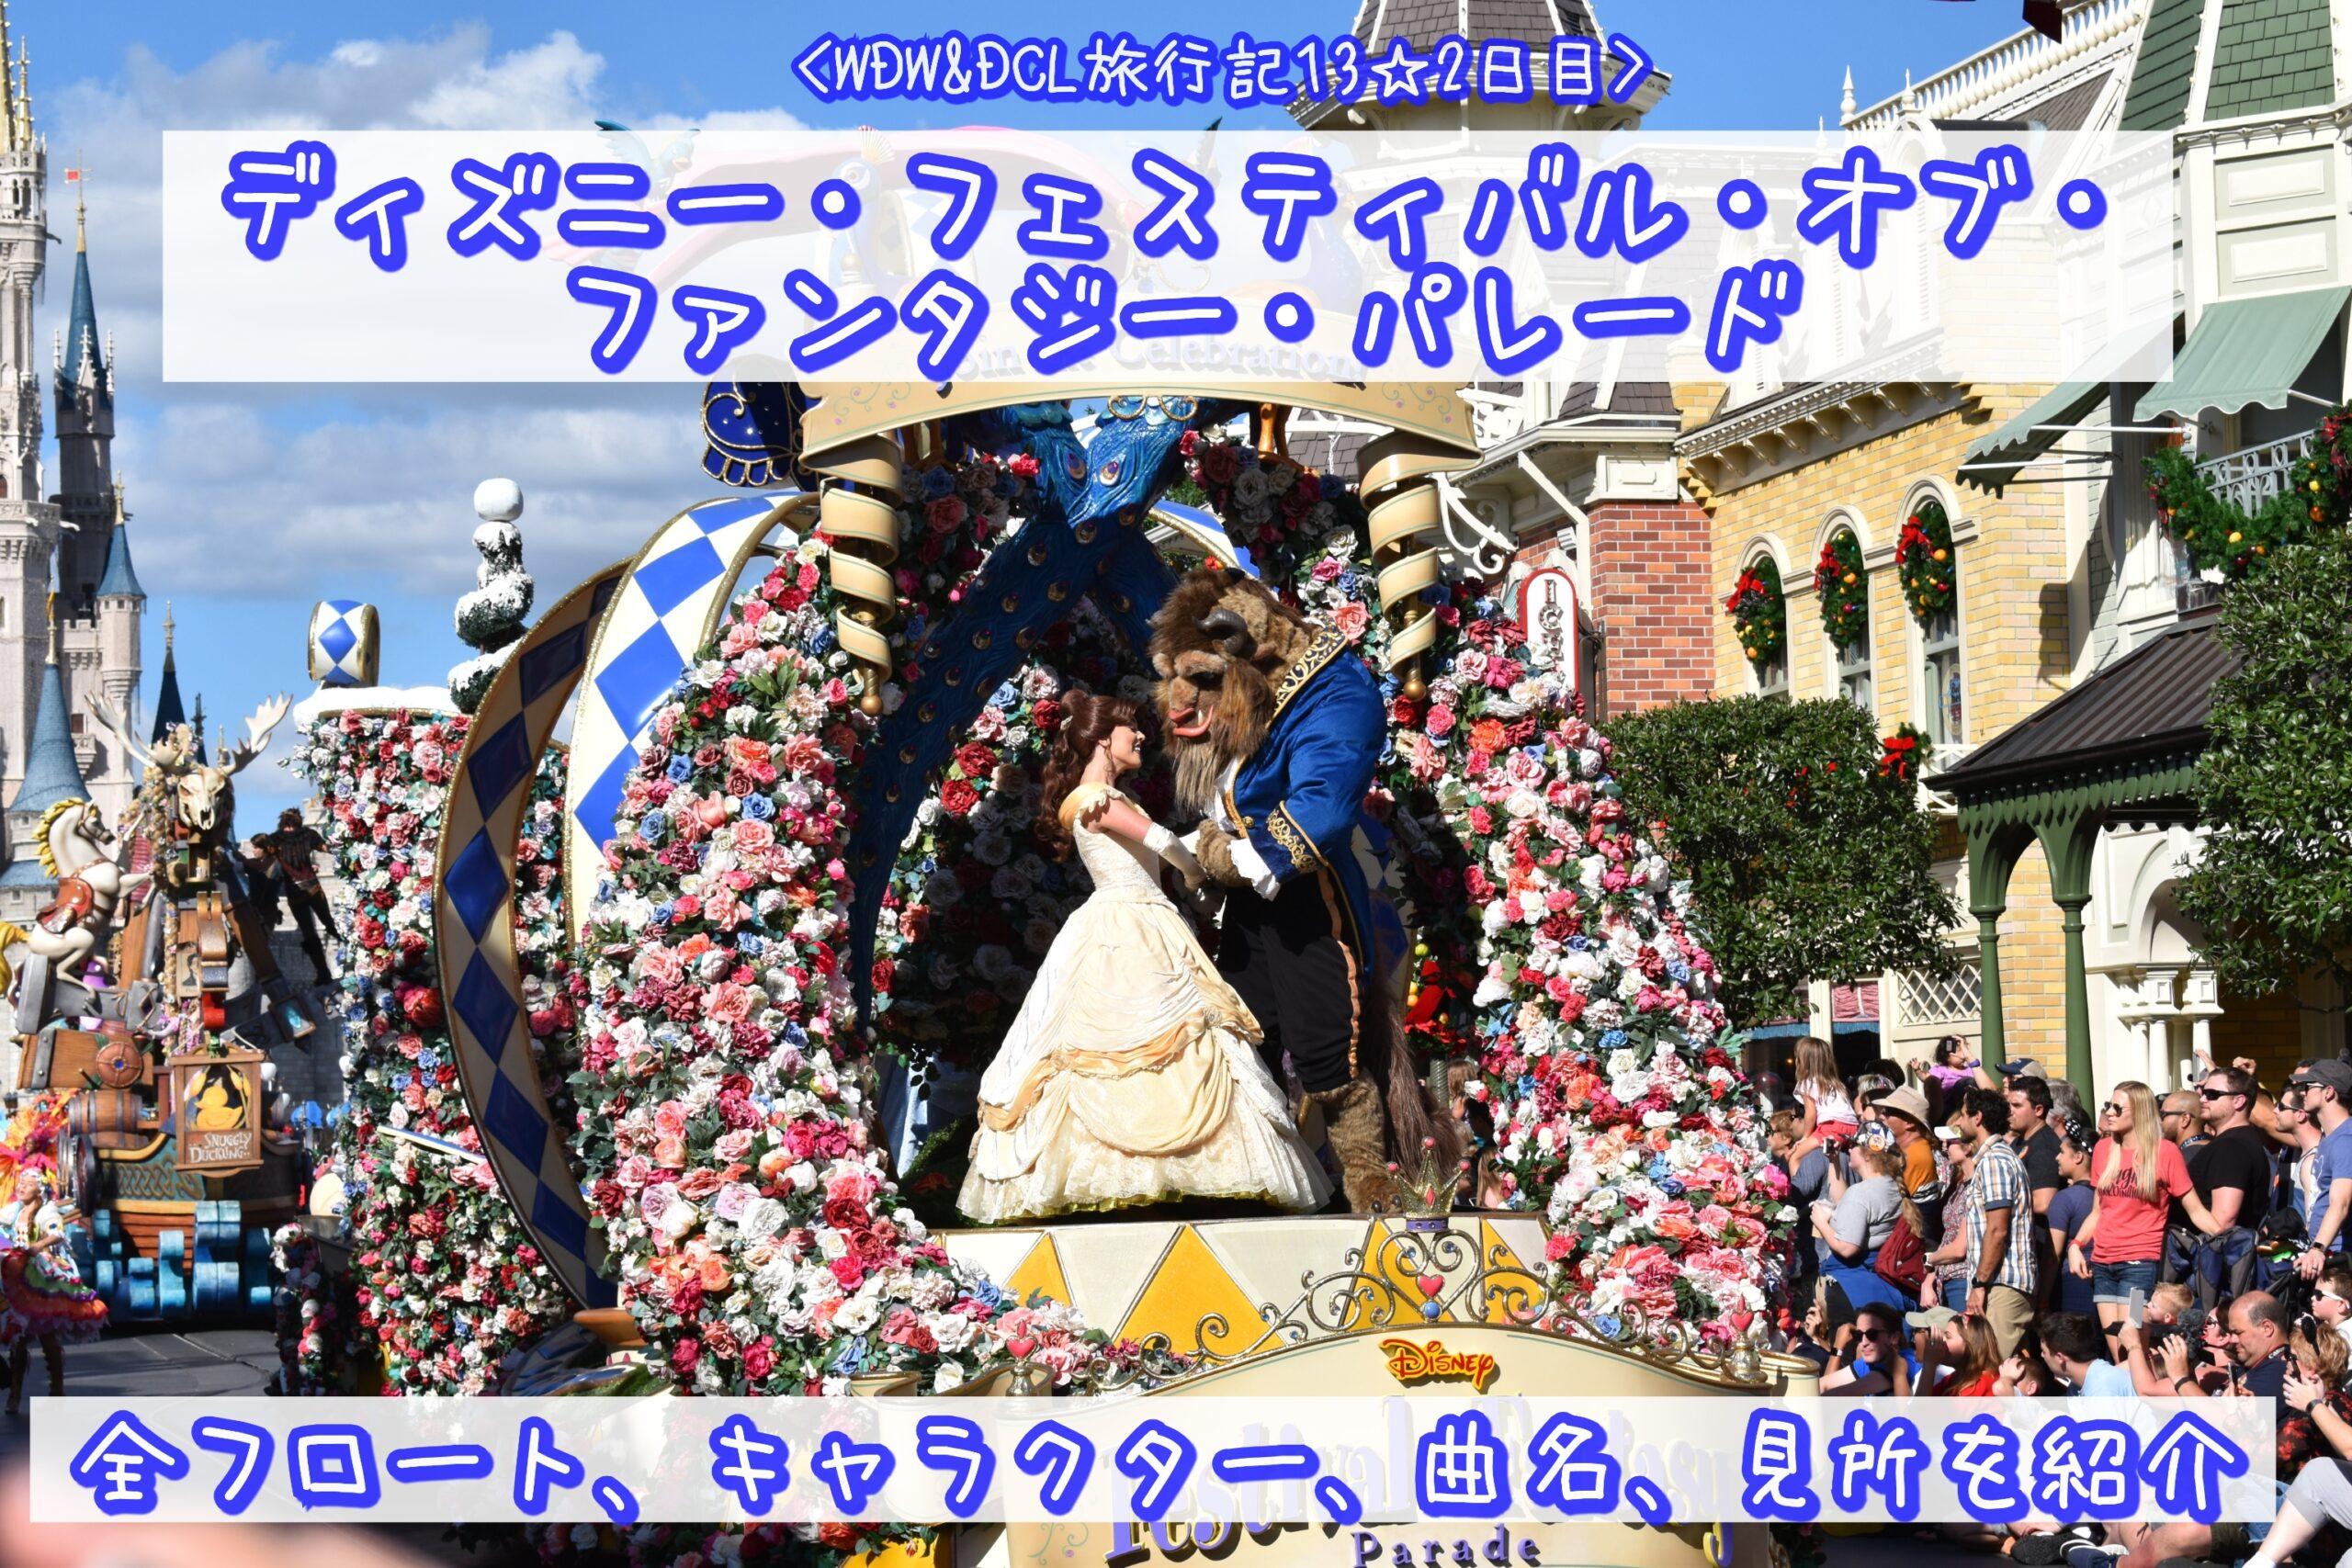 【WDW&DCL】ディズニー・フェスティバル・オブ・ファンタジー・パレードの全フロート、キャラクター、曲名、見所を紹介